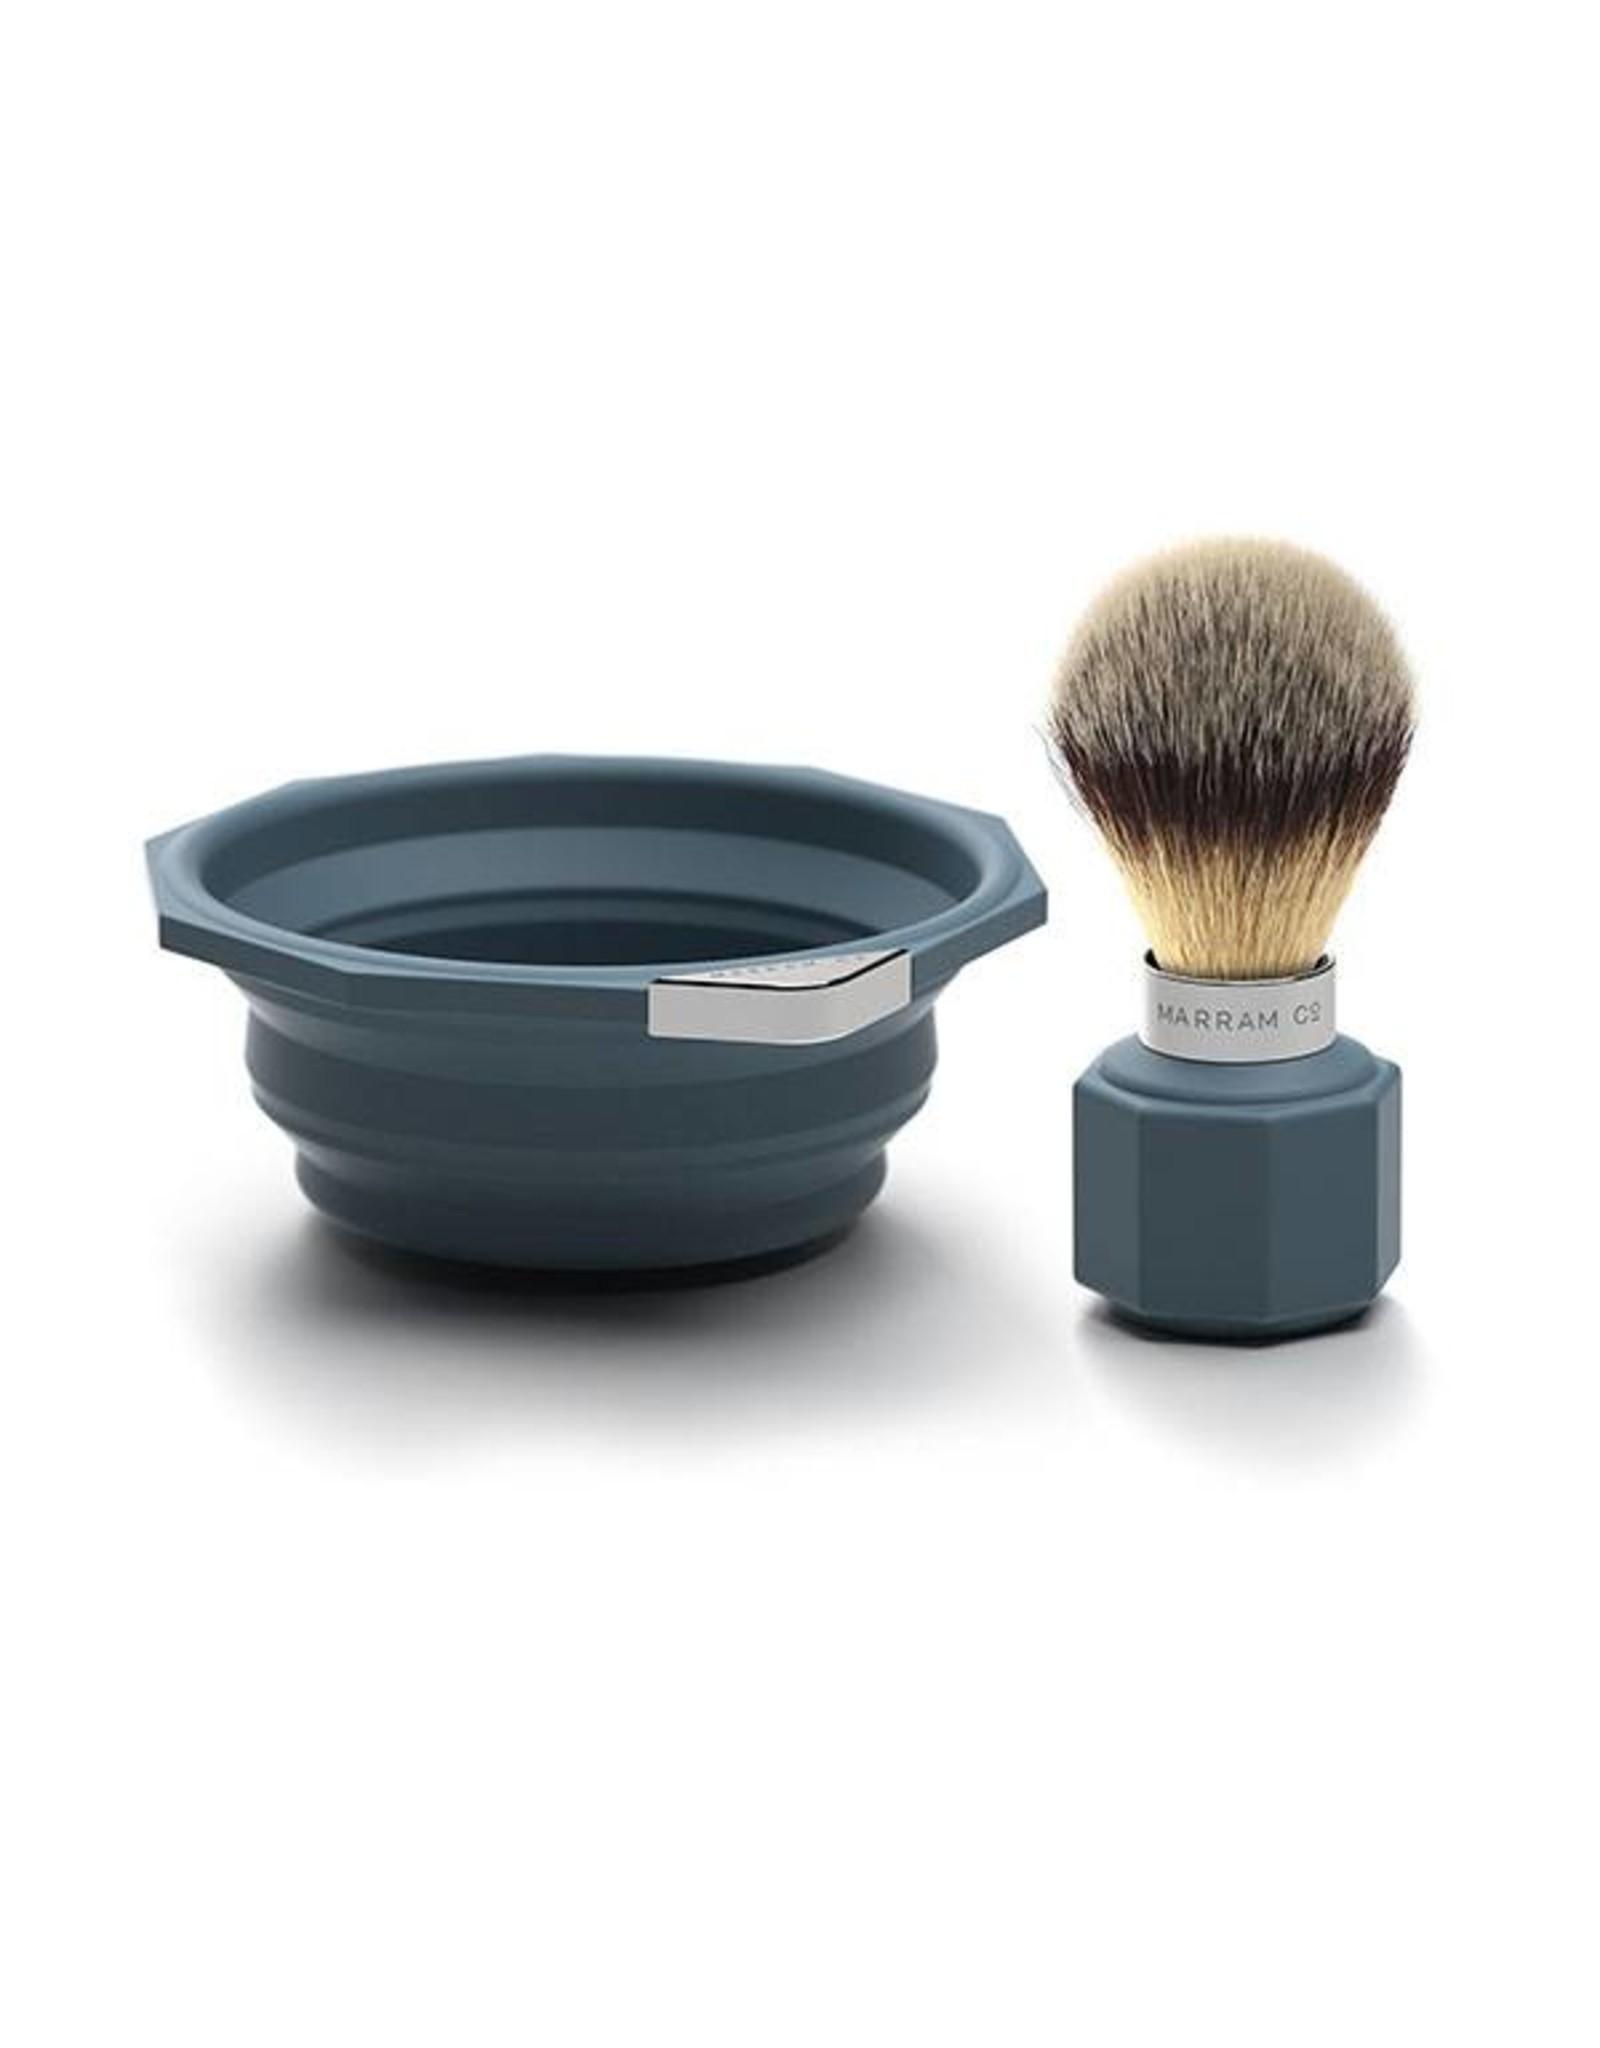 Marram Co POP! Travelling Shaving Brush and Dish | Blue